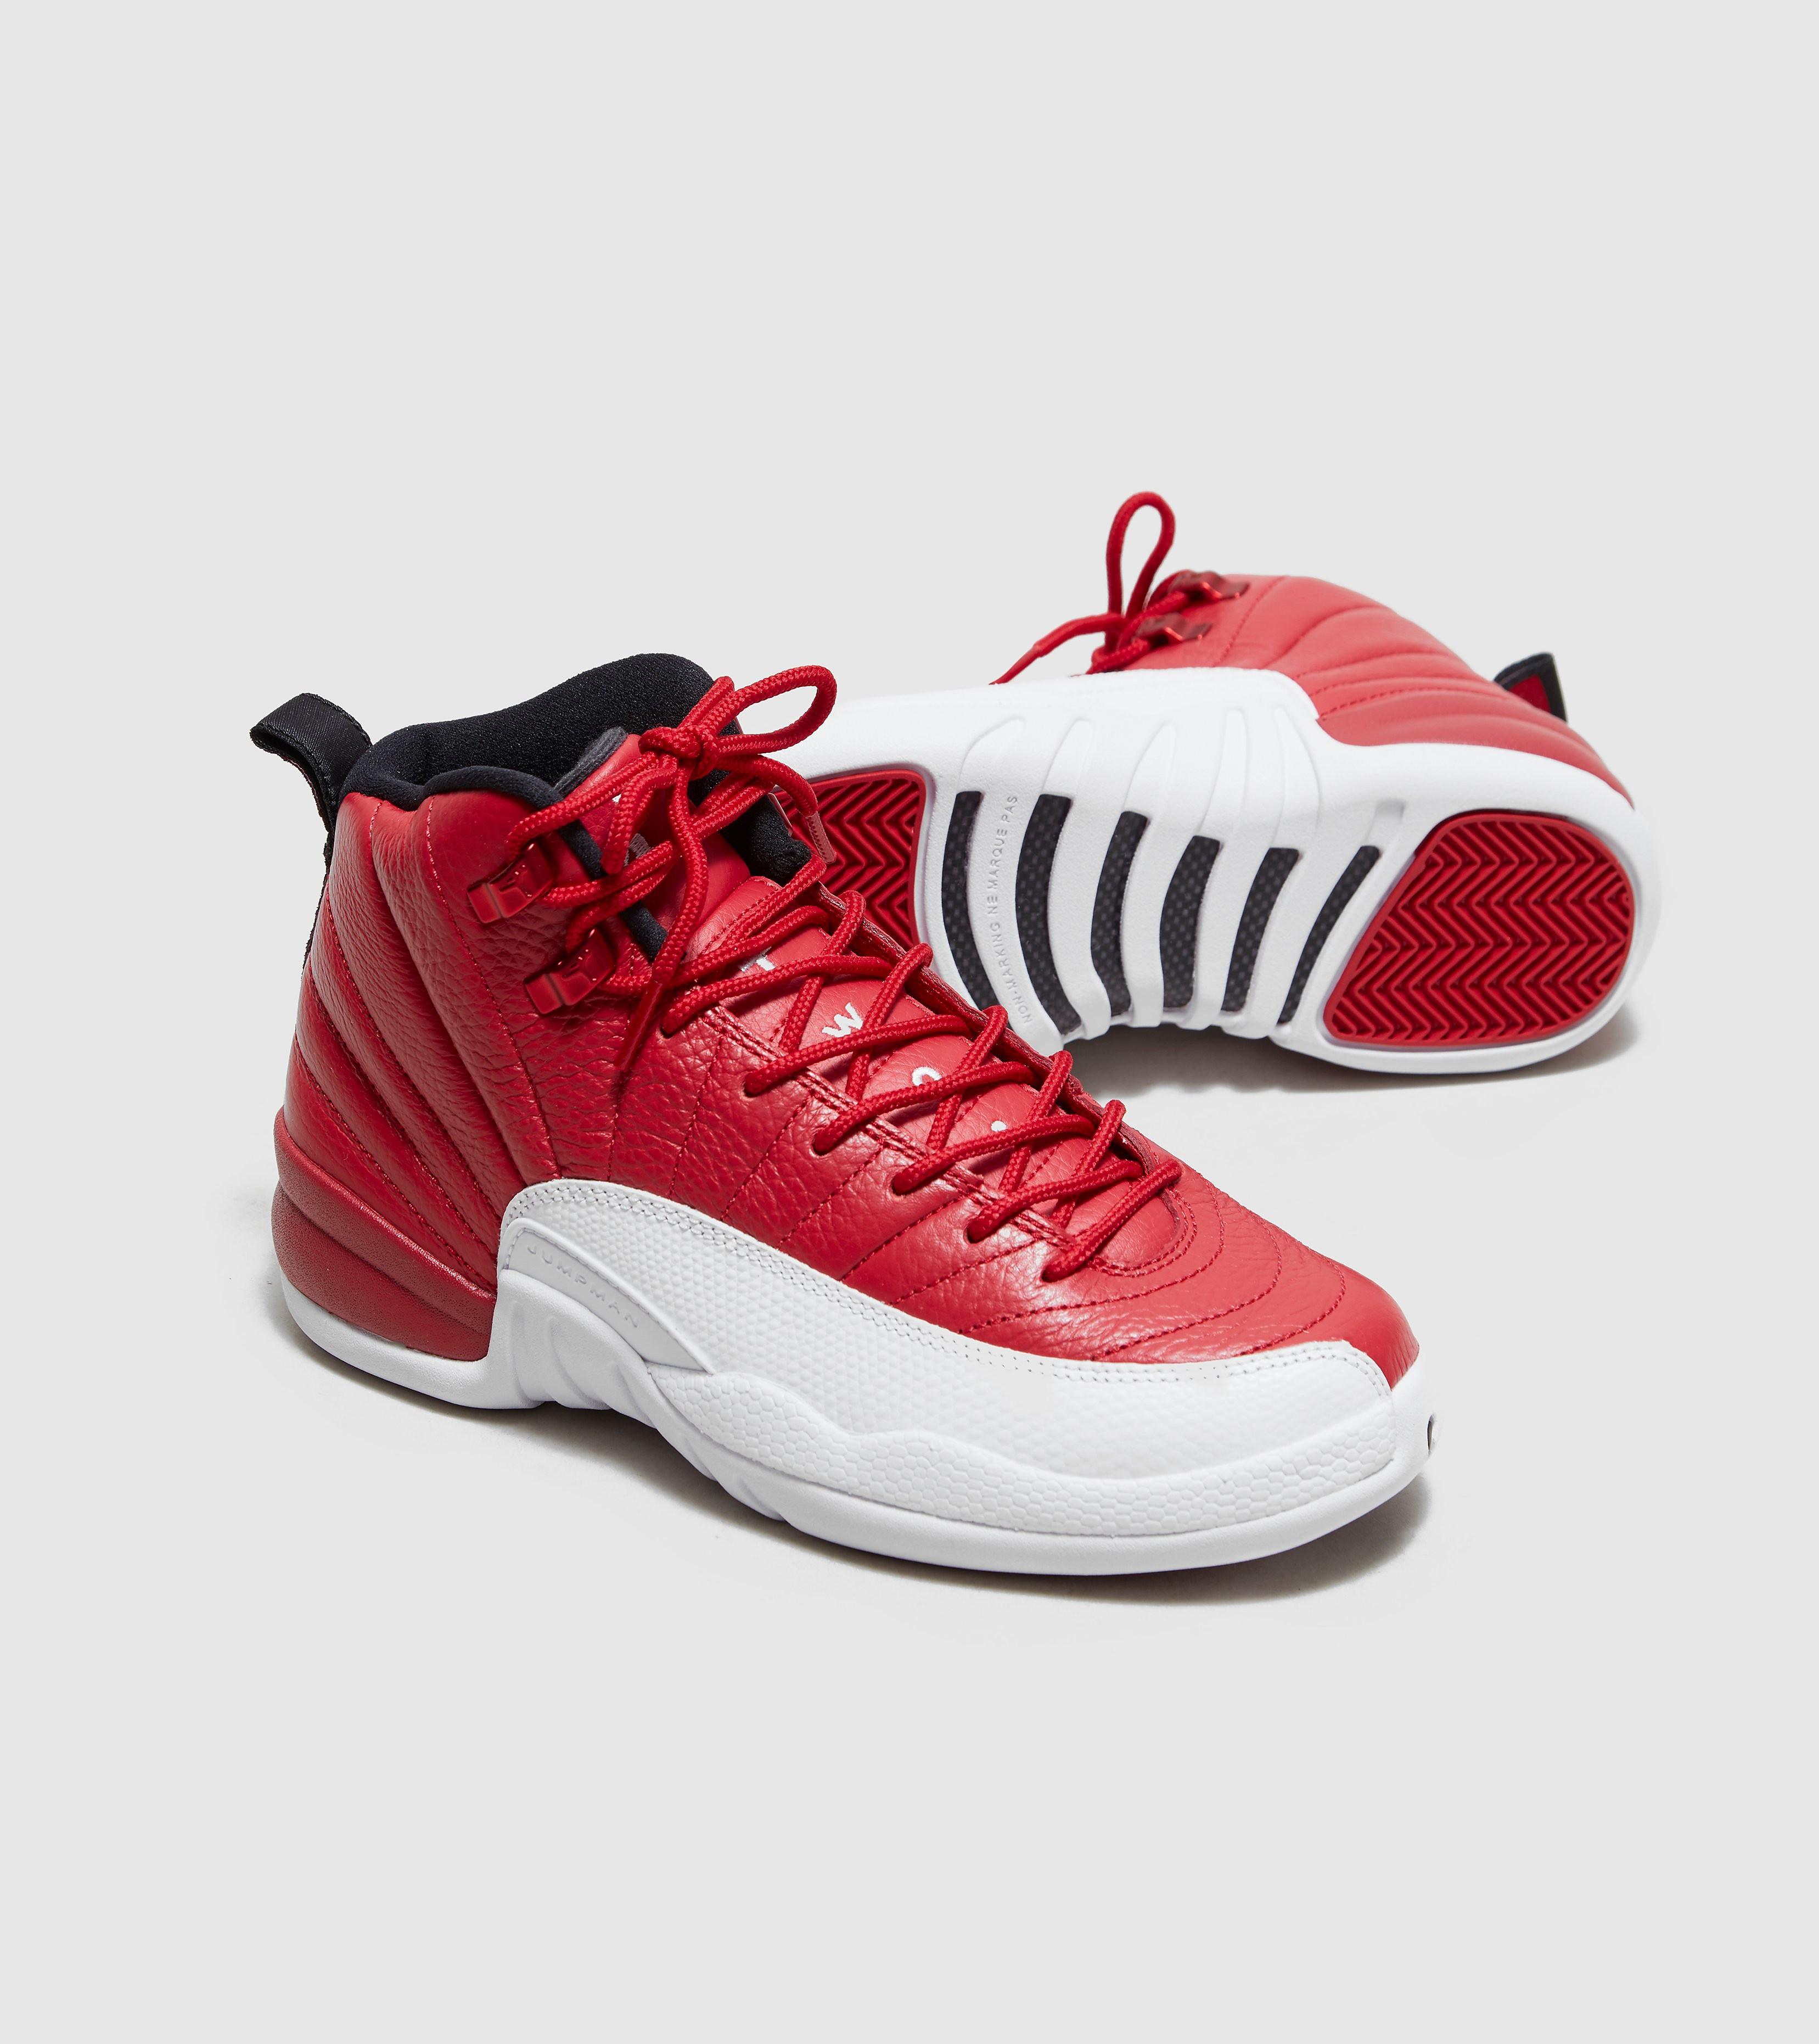 Jordan Air Retro 12 'Gym Red' BG